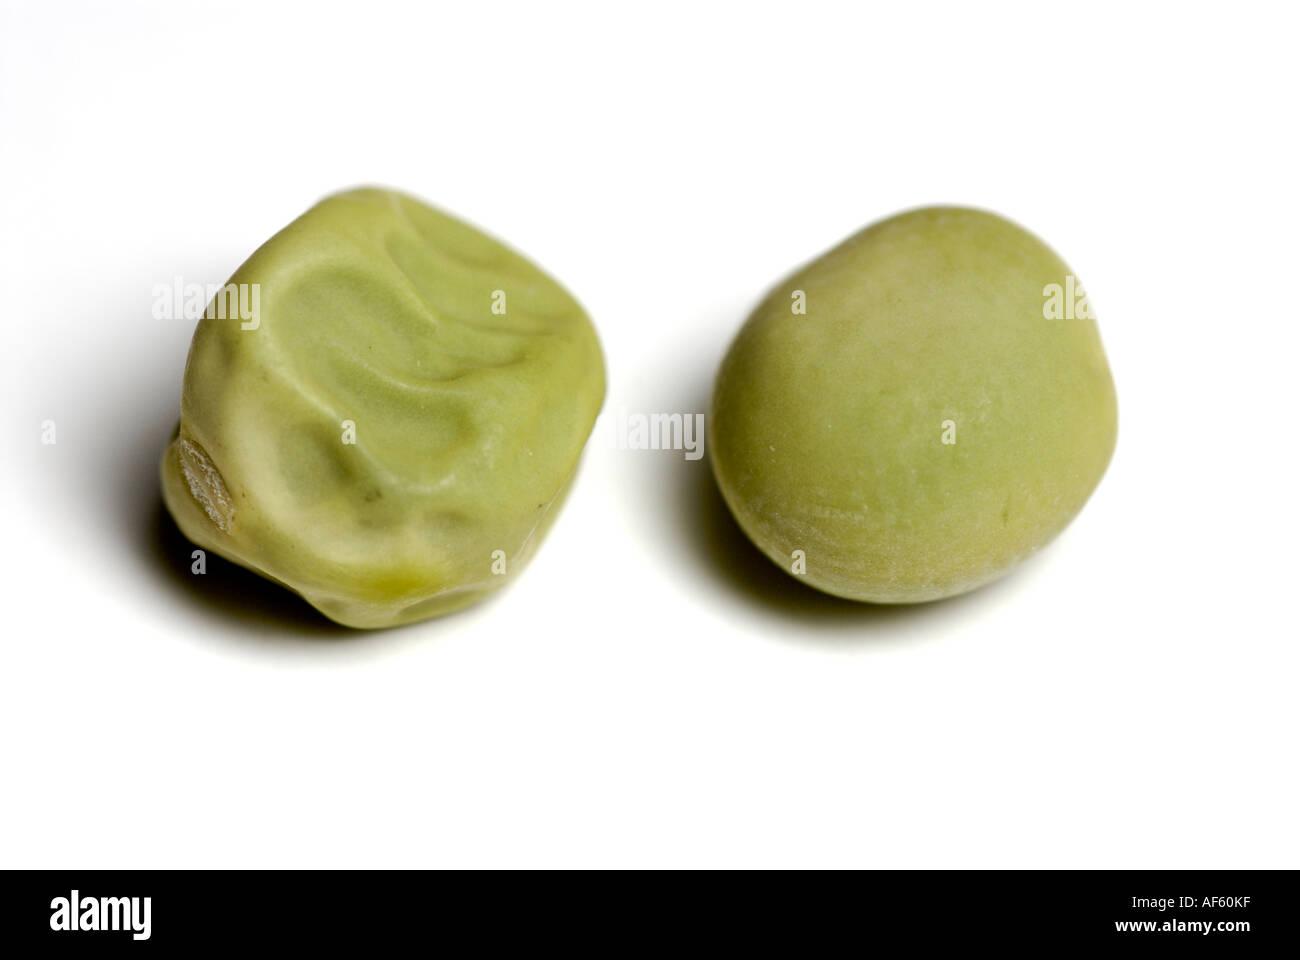 Green Smooth And Wrinkled Pea Seeds Traits Gregor Mendel